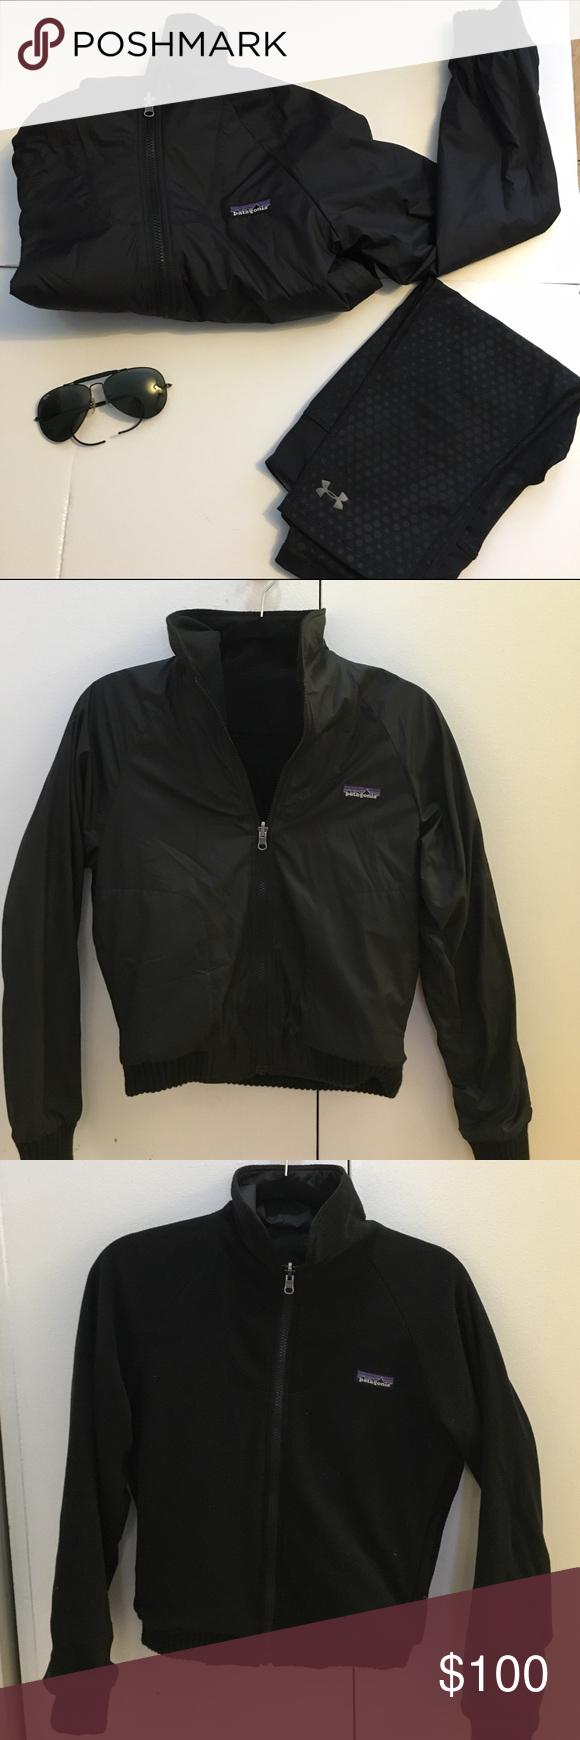 Reversible patagonia fleece jacket patagonia fleece jacket